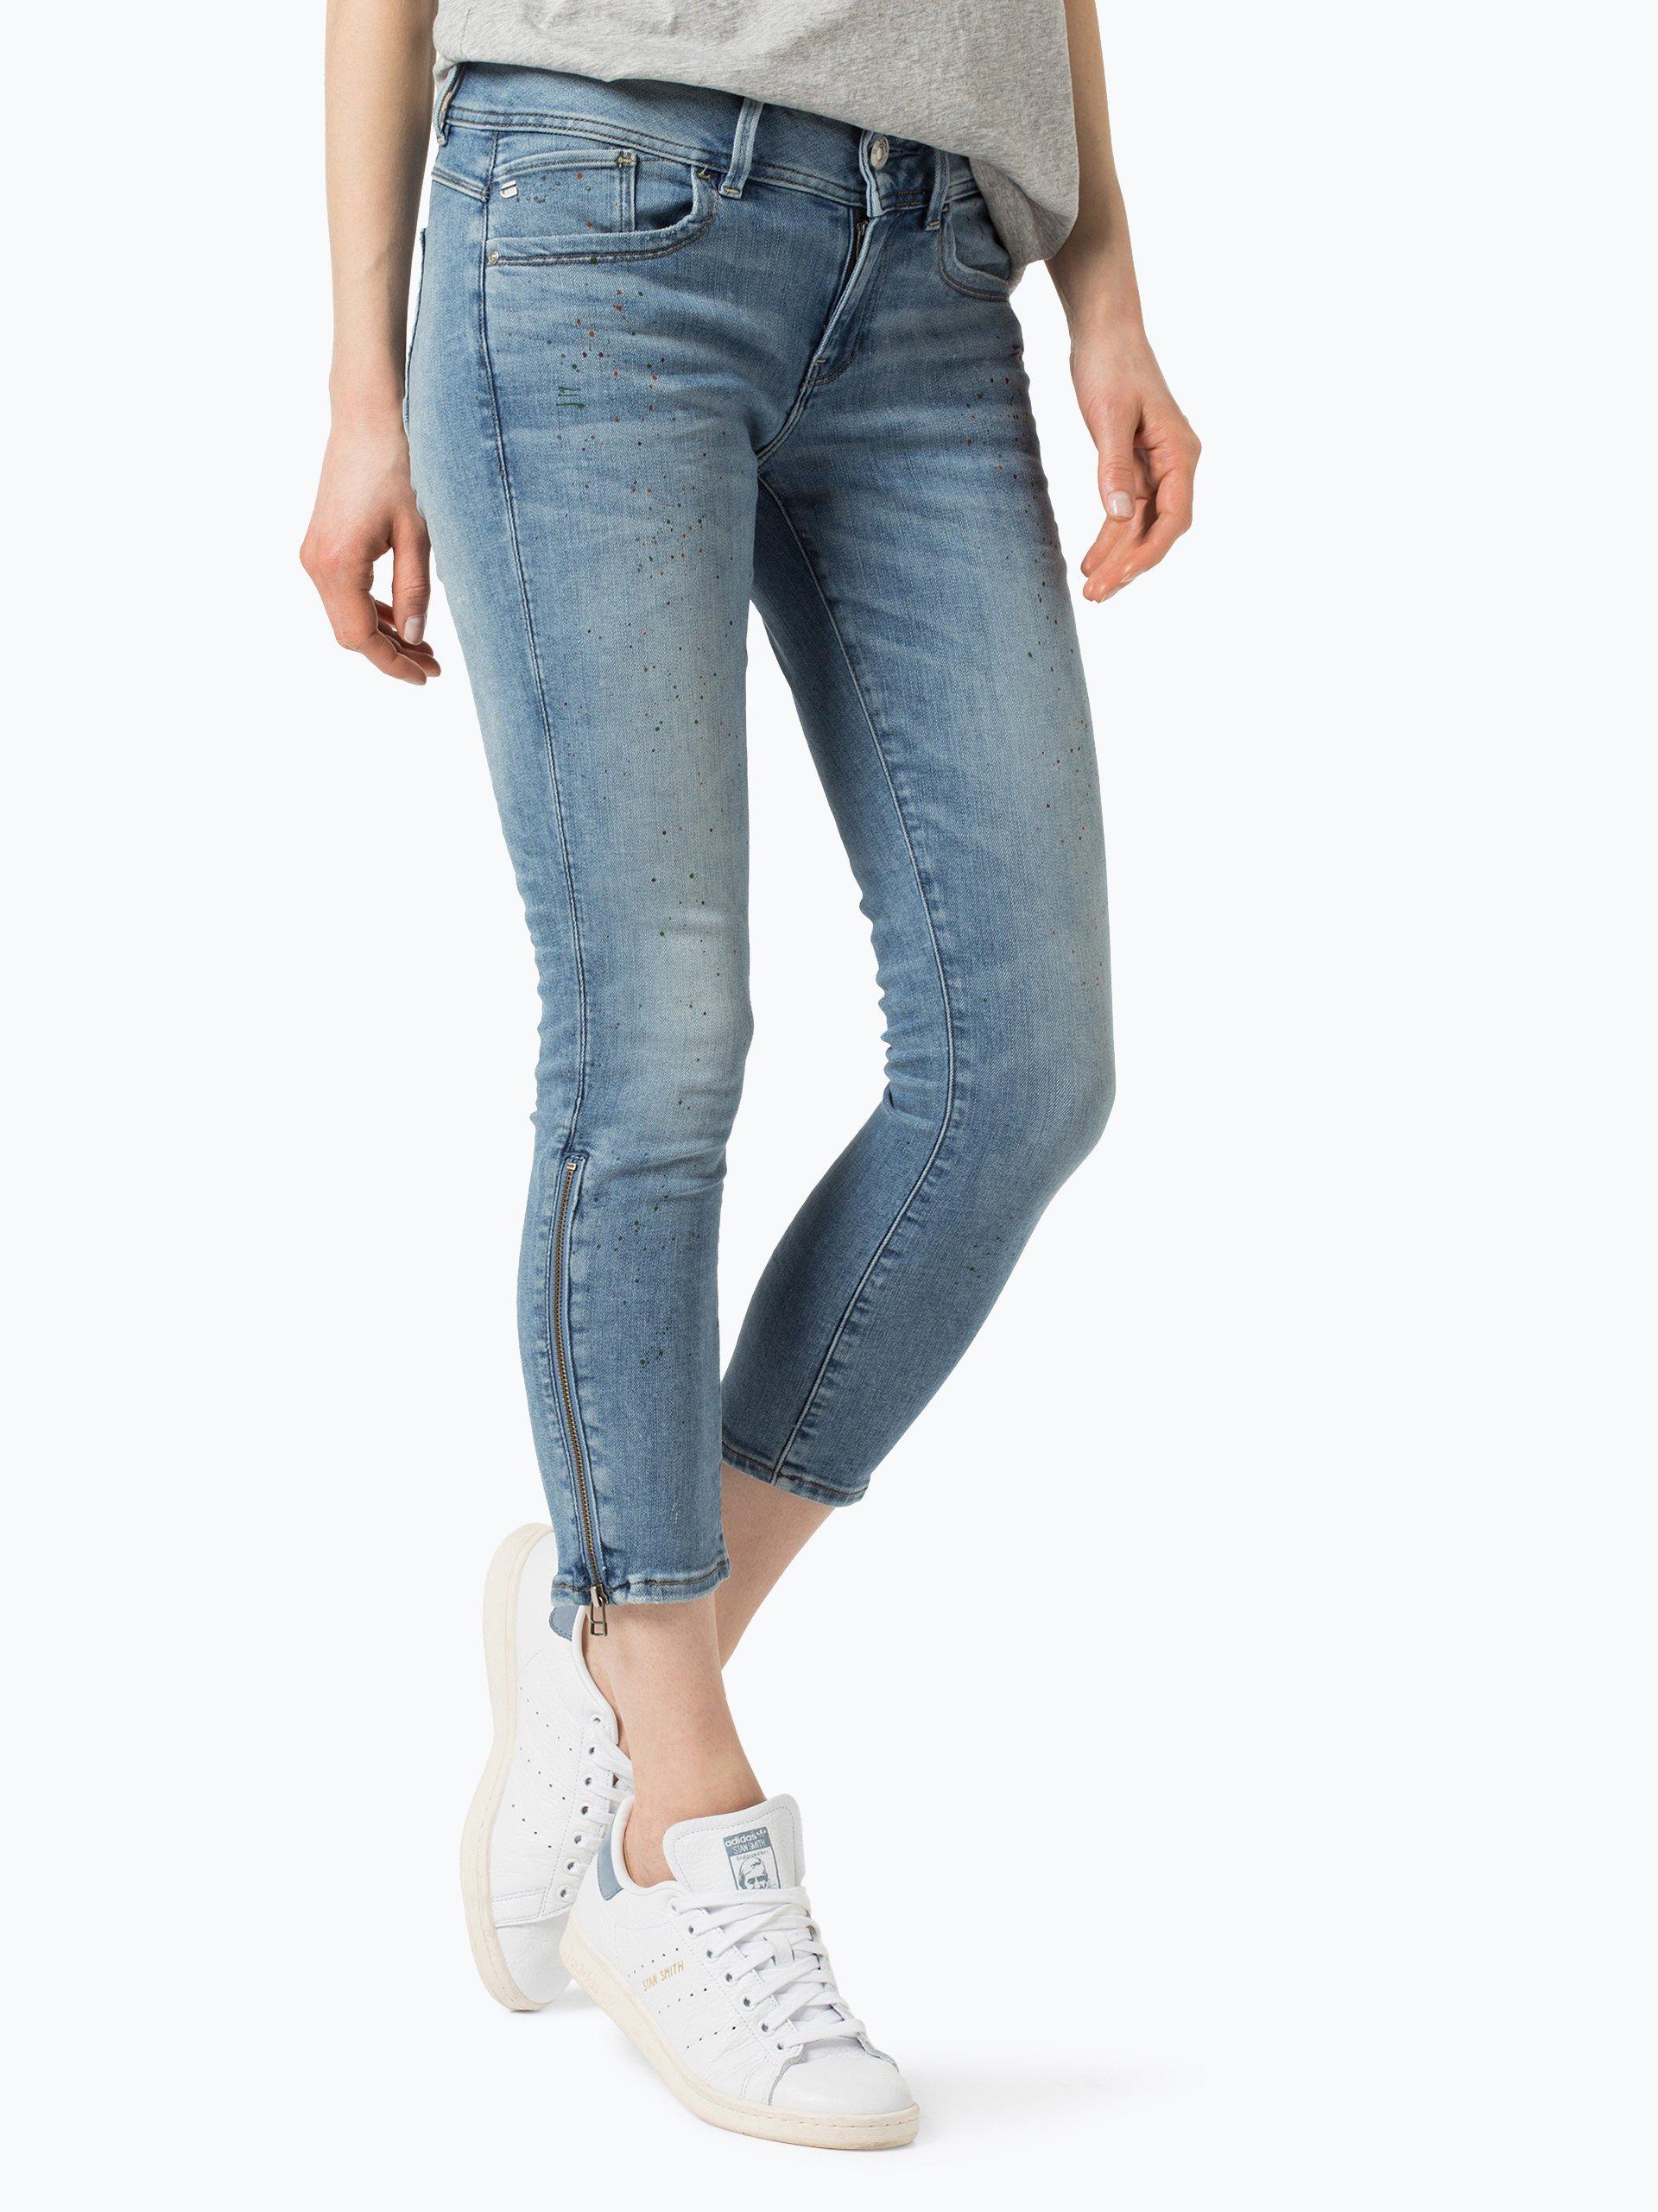 G-Star Damen Jeans - Lynn